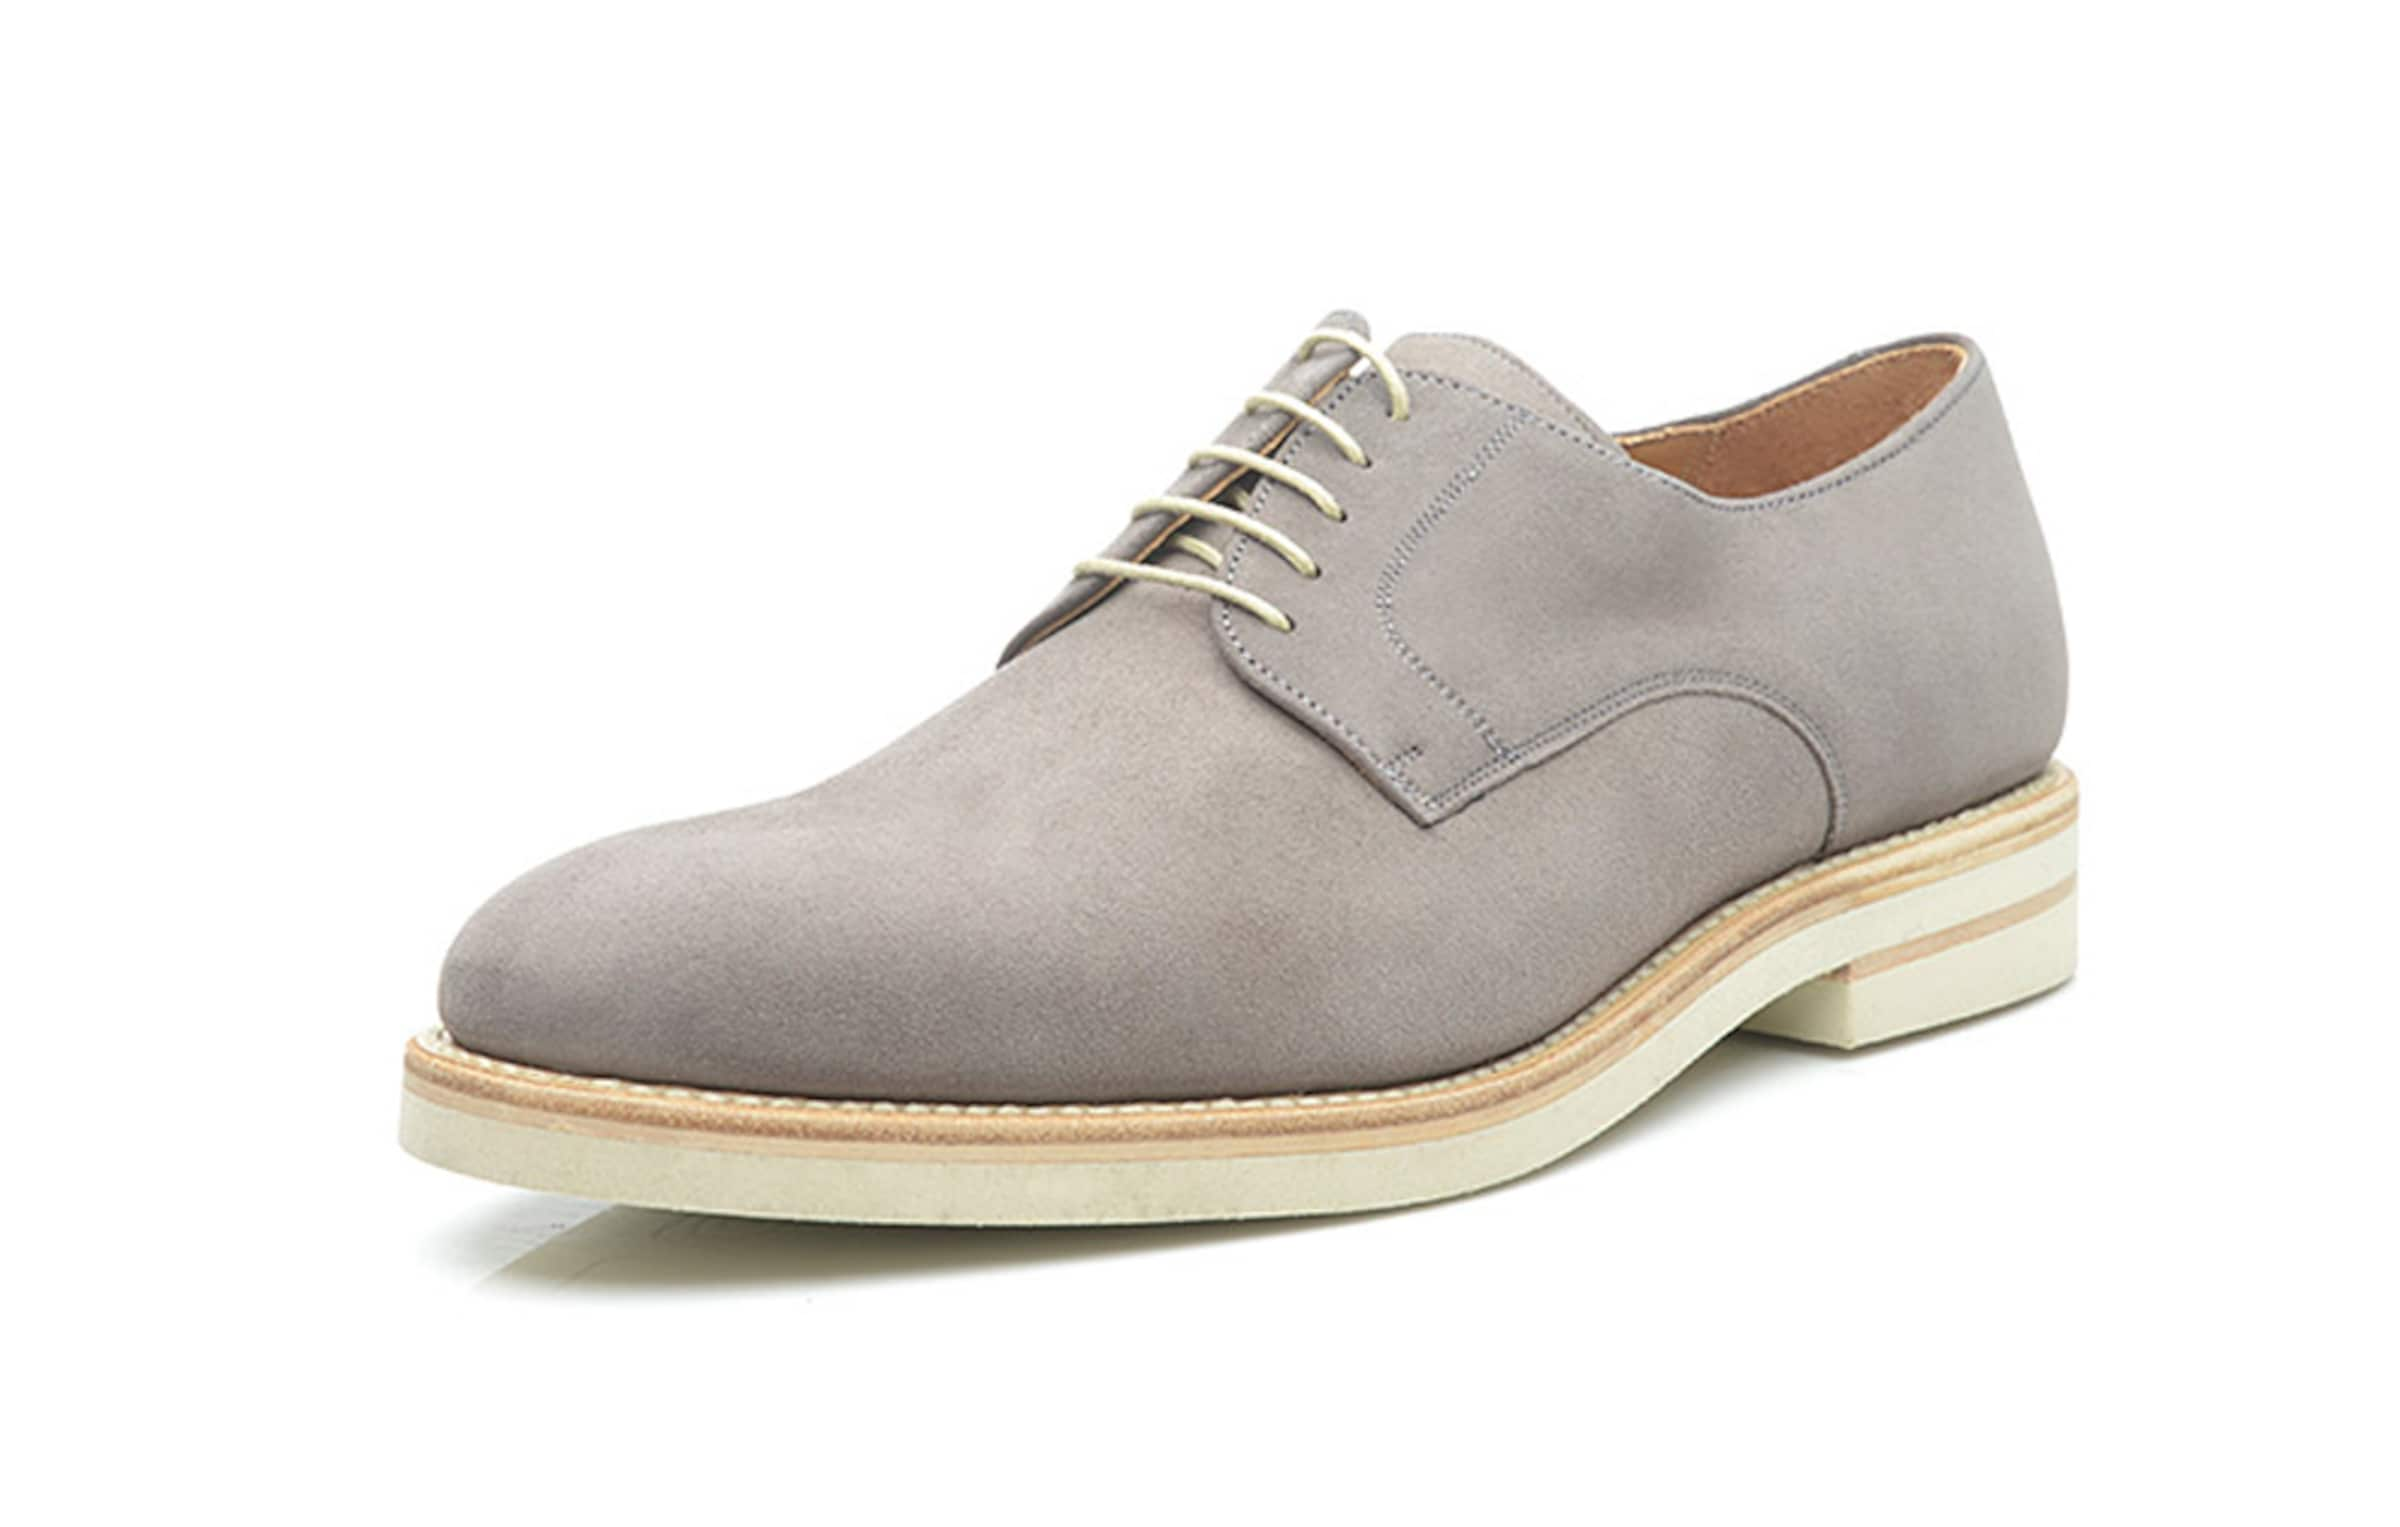 SHOEPASSION Halbschuhe No. 317 Verschleißfeste billige Schuhe